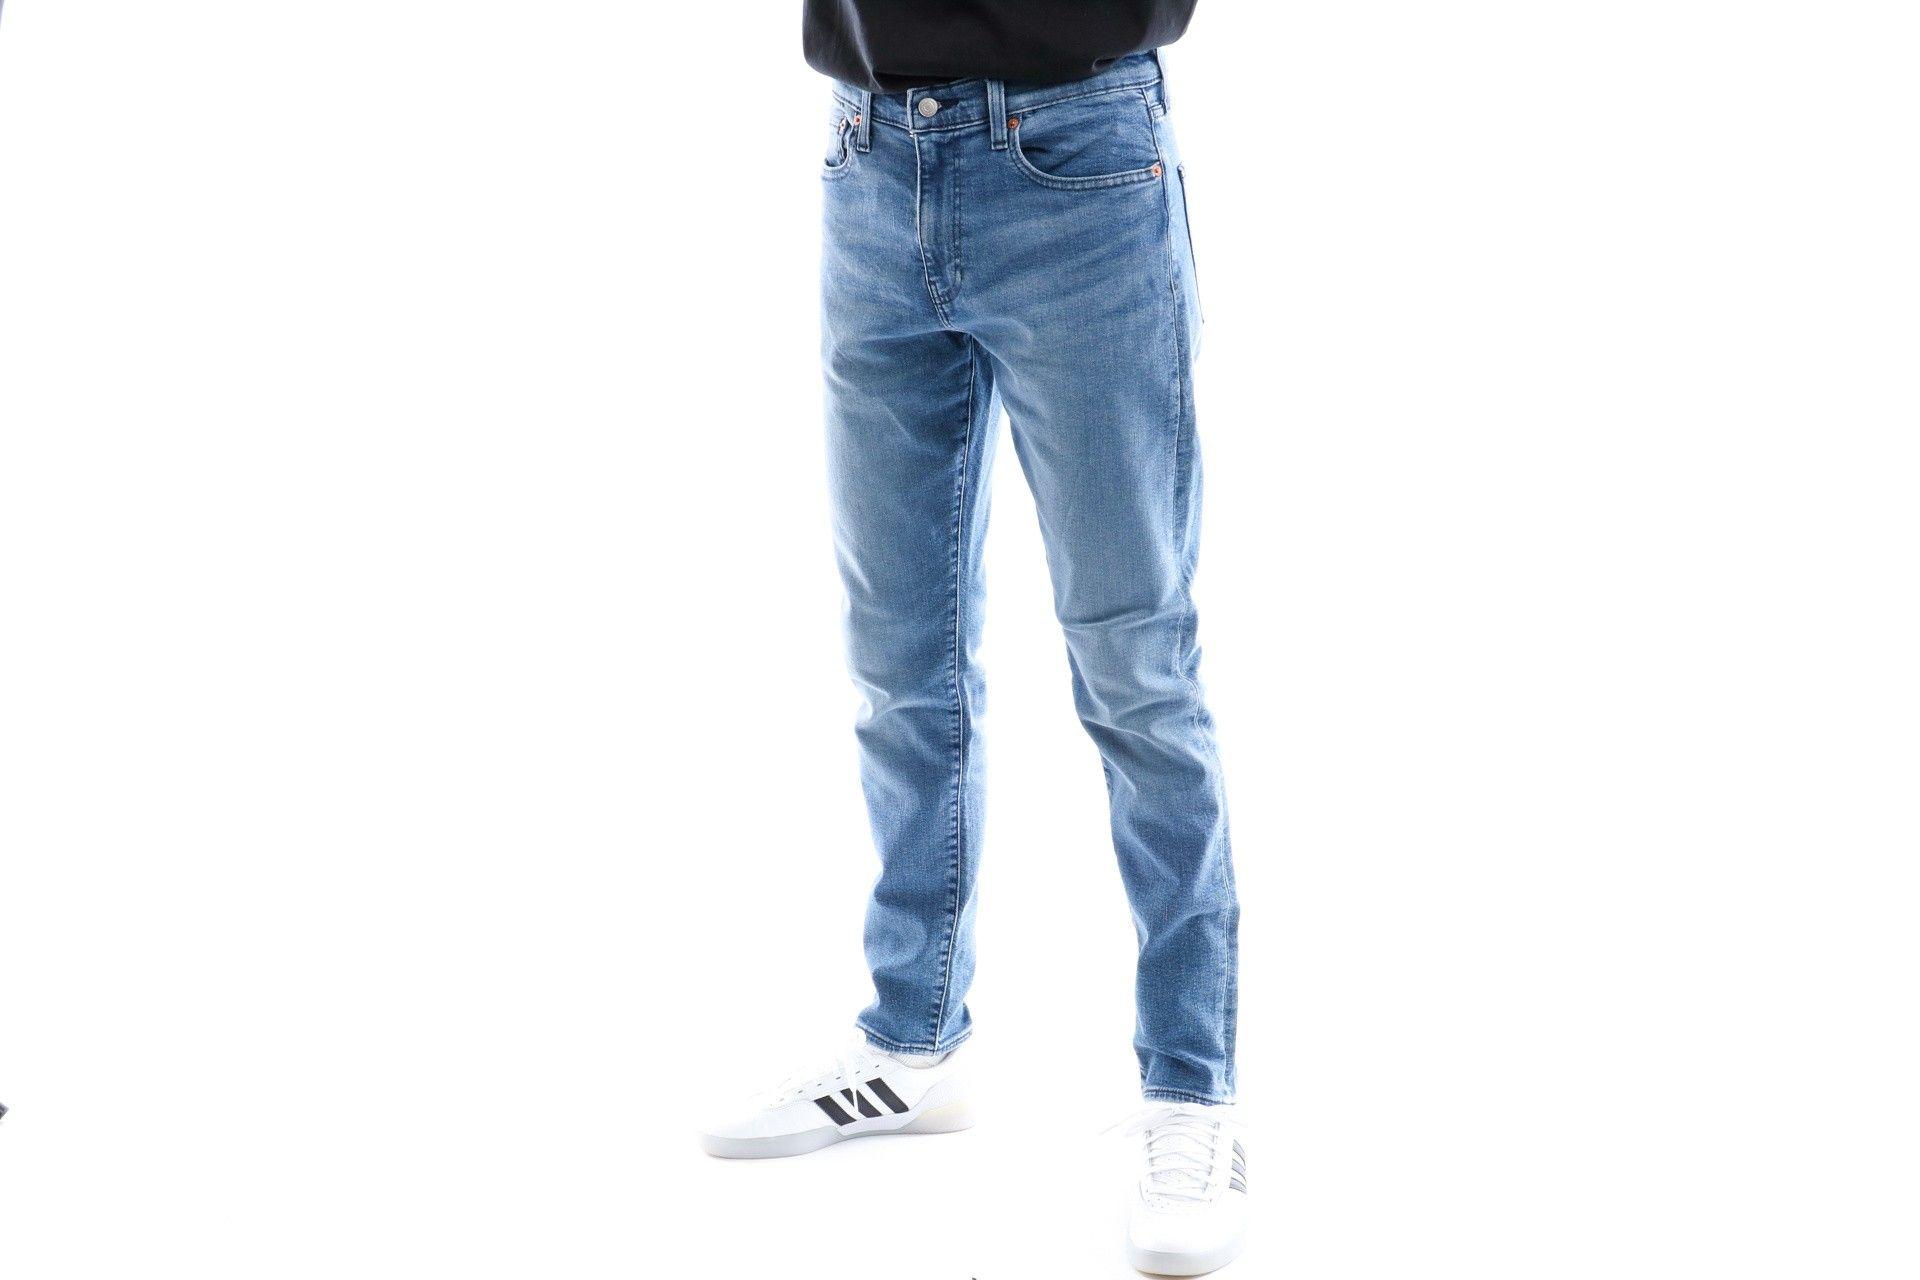 Afbeelding van Levi's 512™ Slim Taper Fit 28833-0492 Jeans Cedar Light Mid Overt Adv